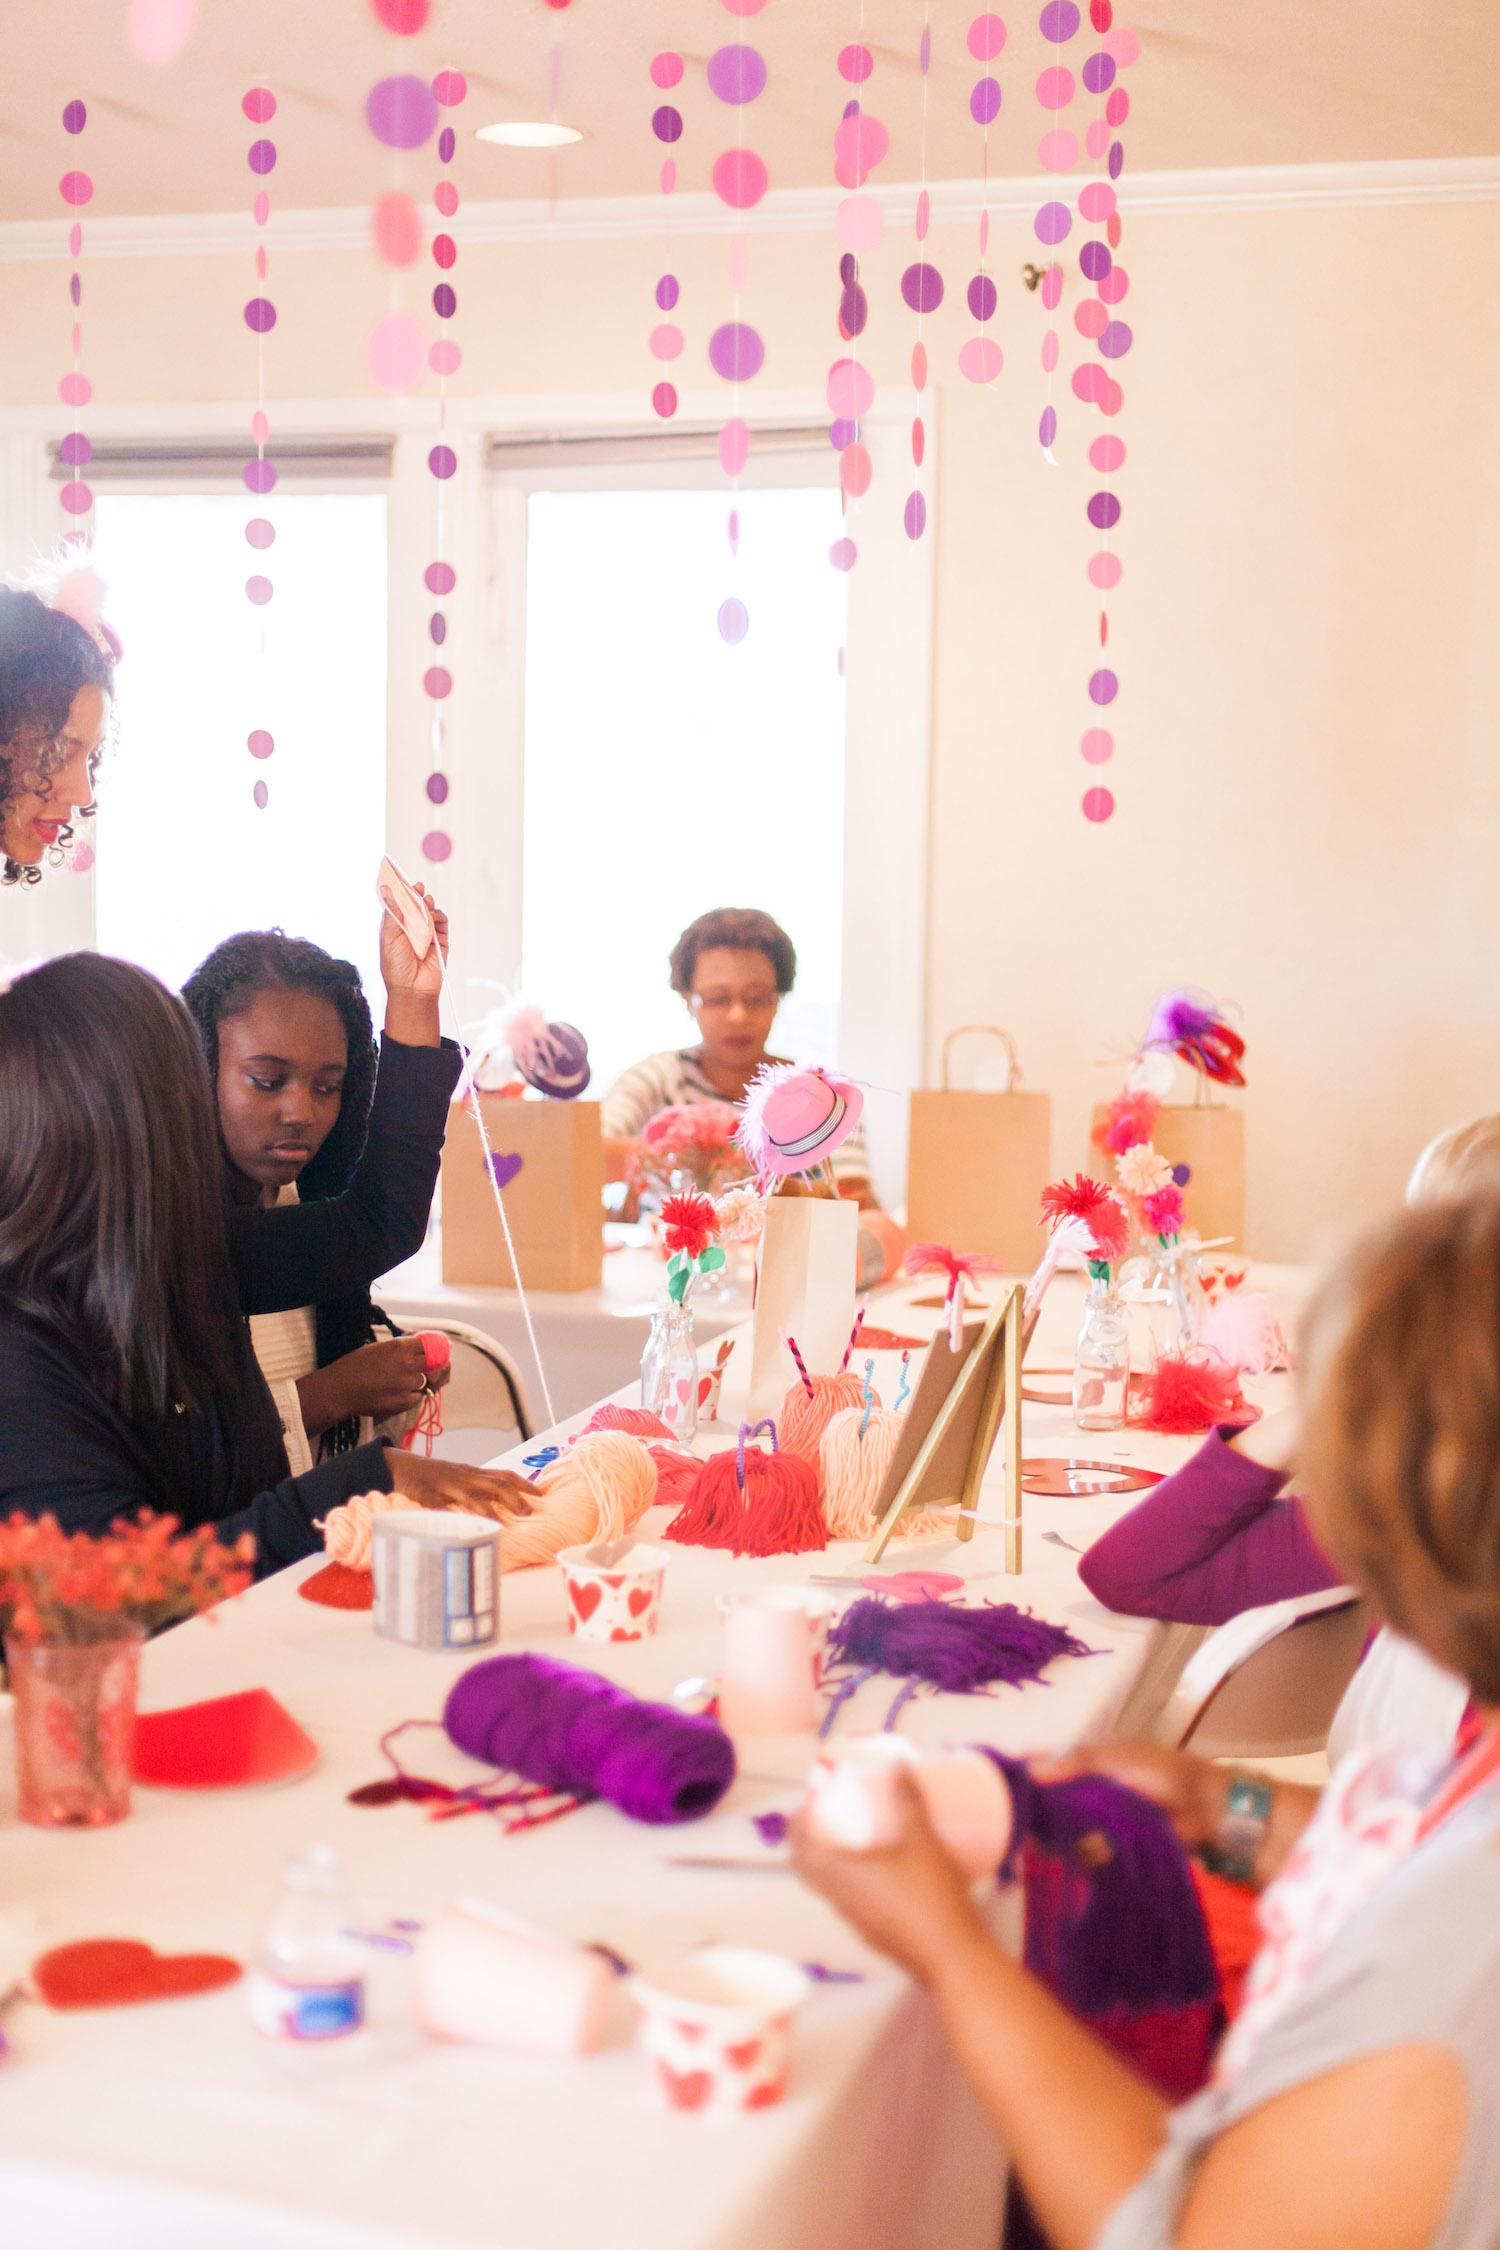 art-craft-valentines-day-party-Connie-Meinhardt-Photography-activities.jpg